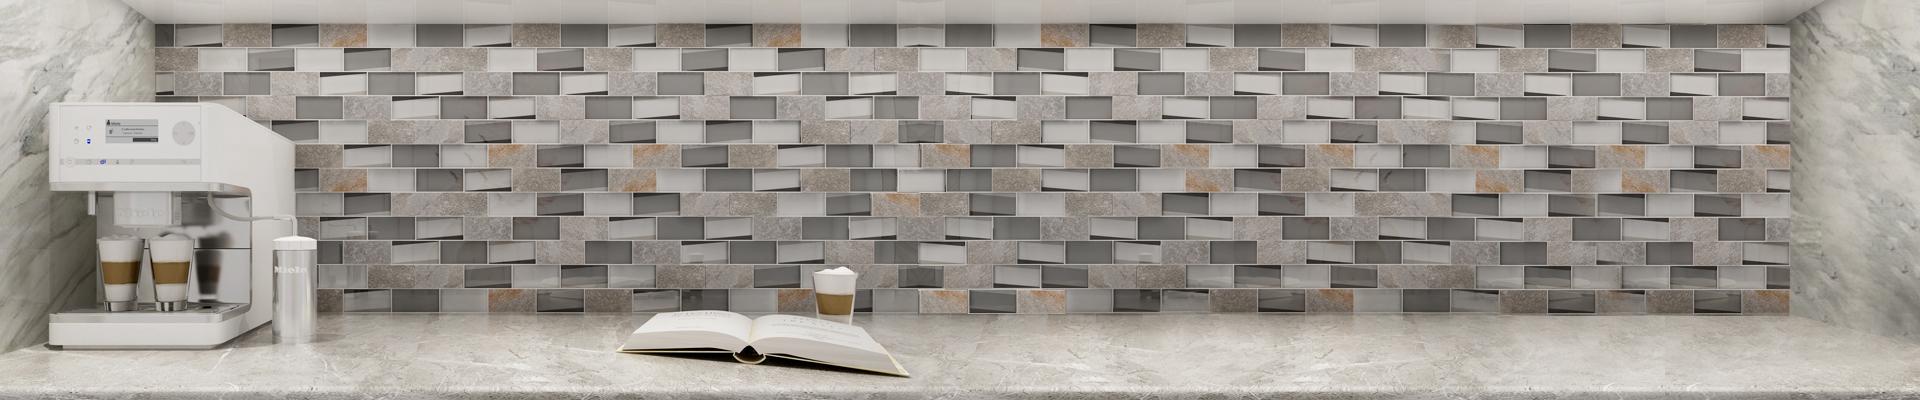 product-glass kitchen backsplash tile-Heng Xing-img